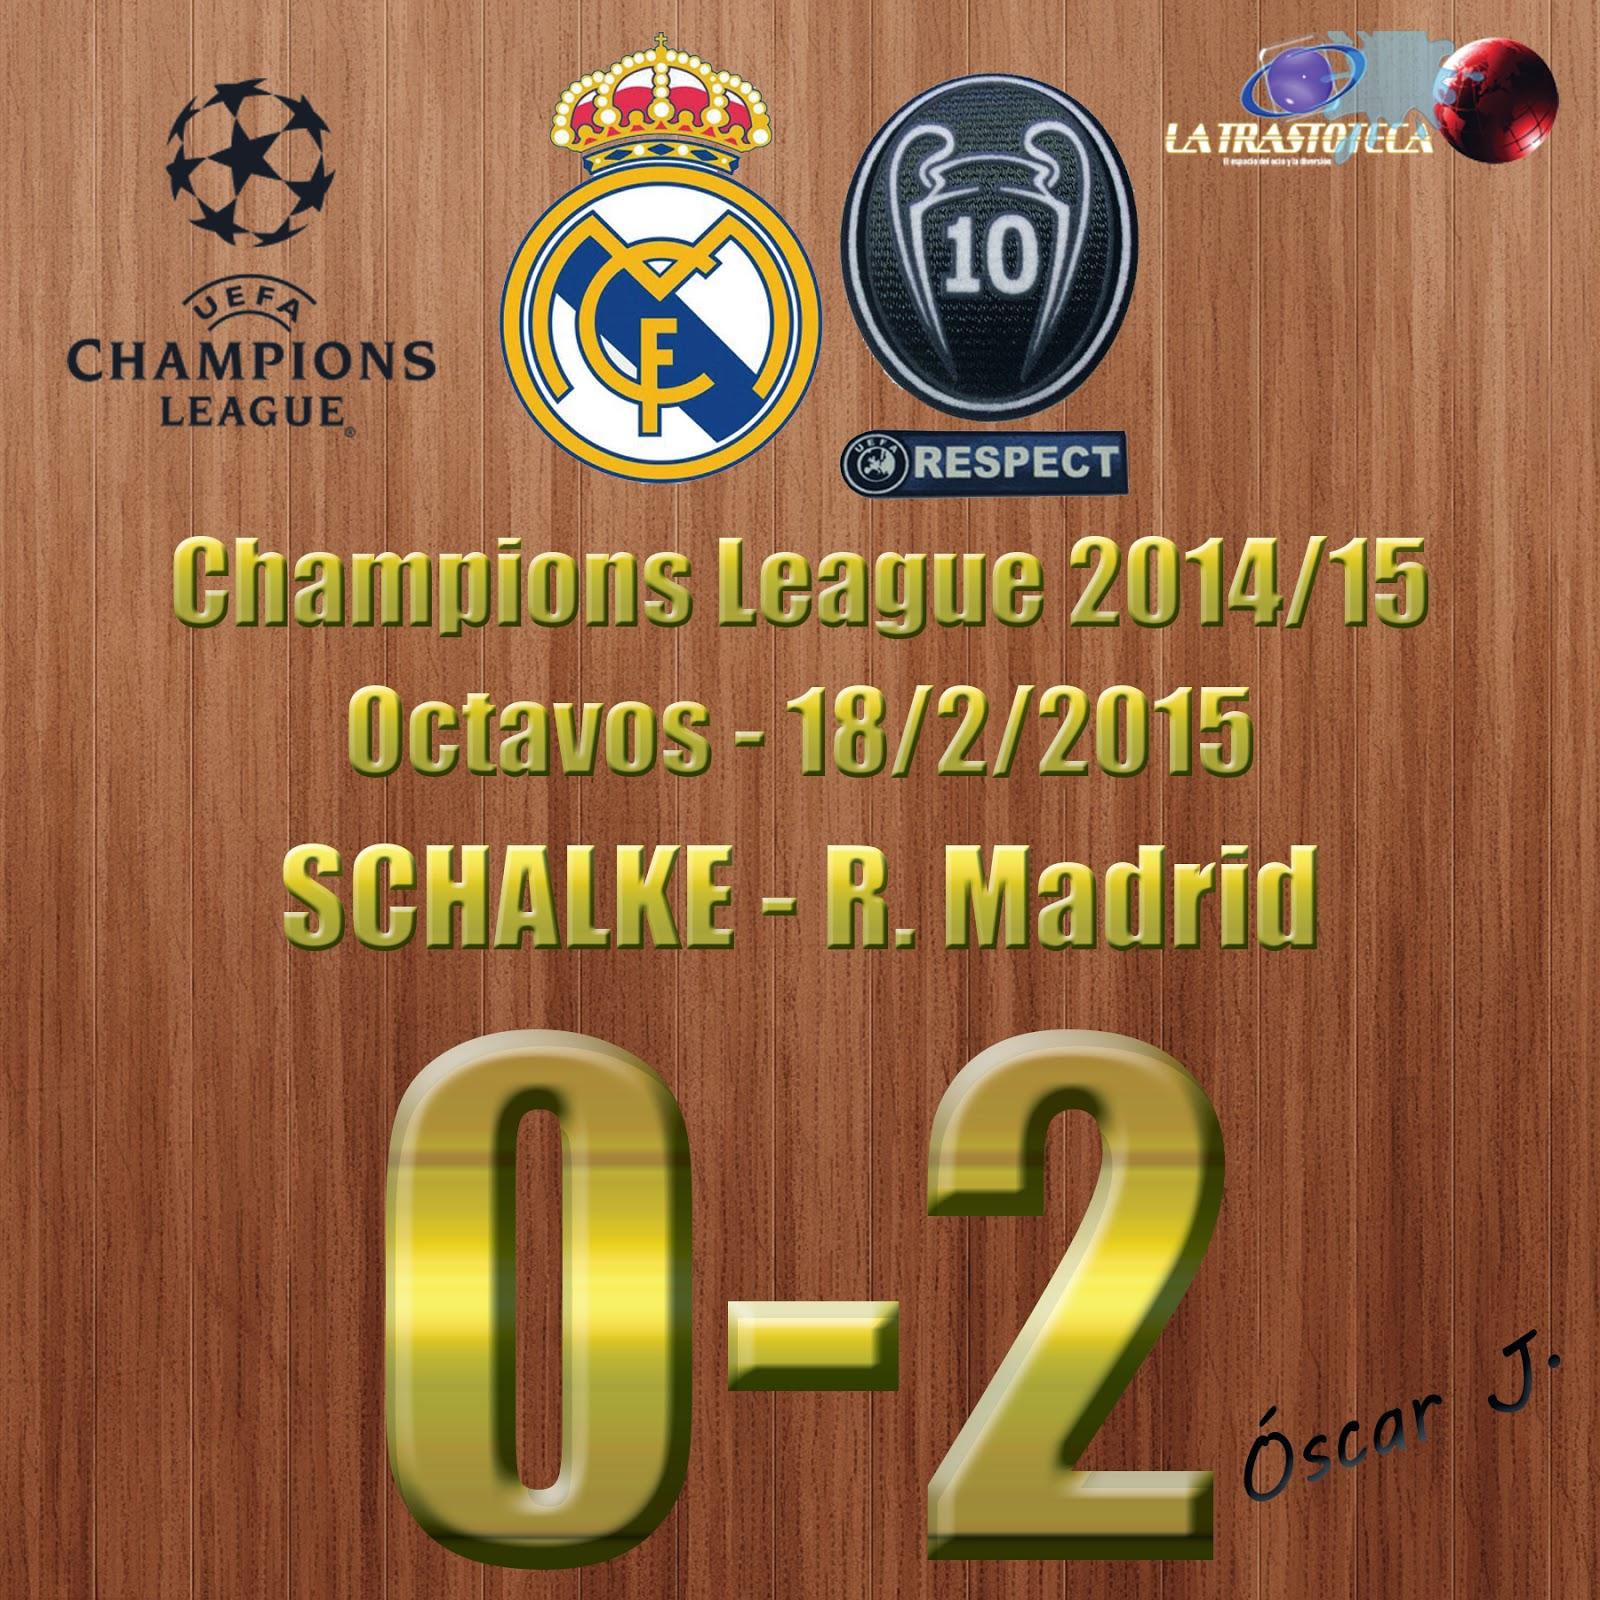 Shalke 04 0-2 Real Madrid - Champions League 2014/15 - Octavos - (18/2/2014)